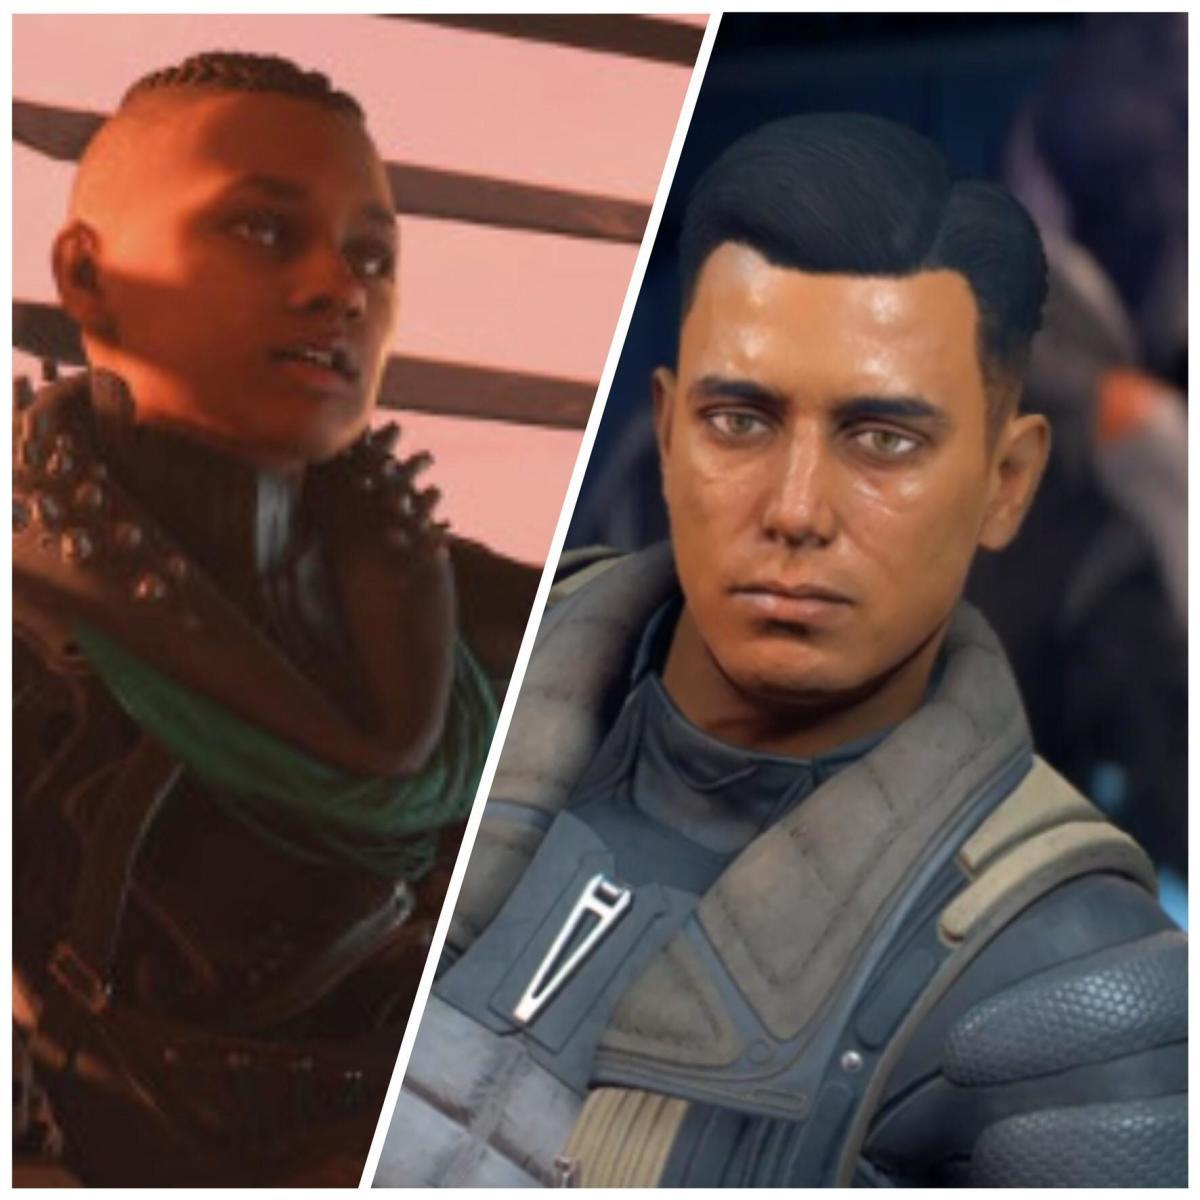 Reyes and Sloane screenshots.